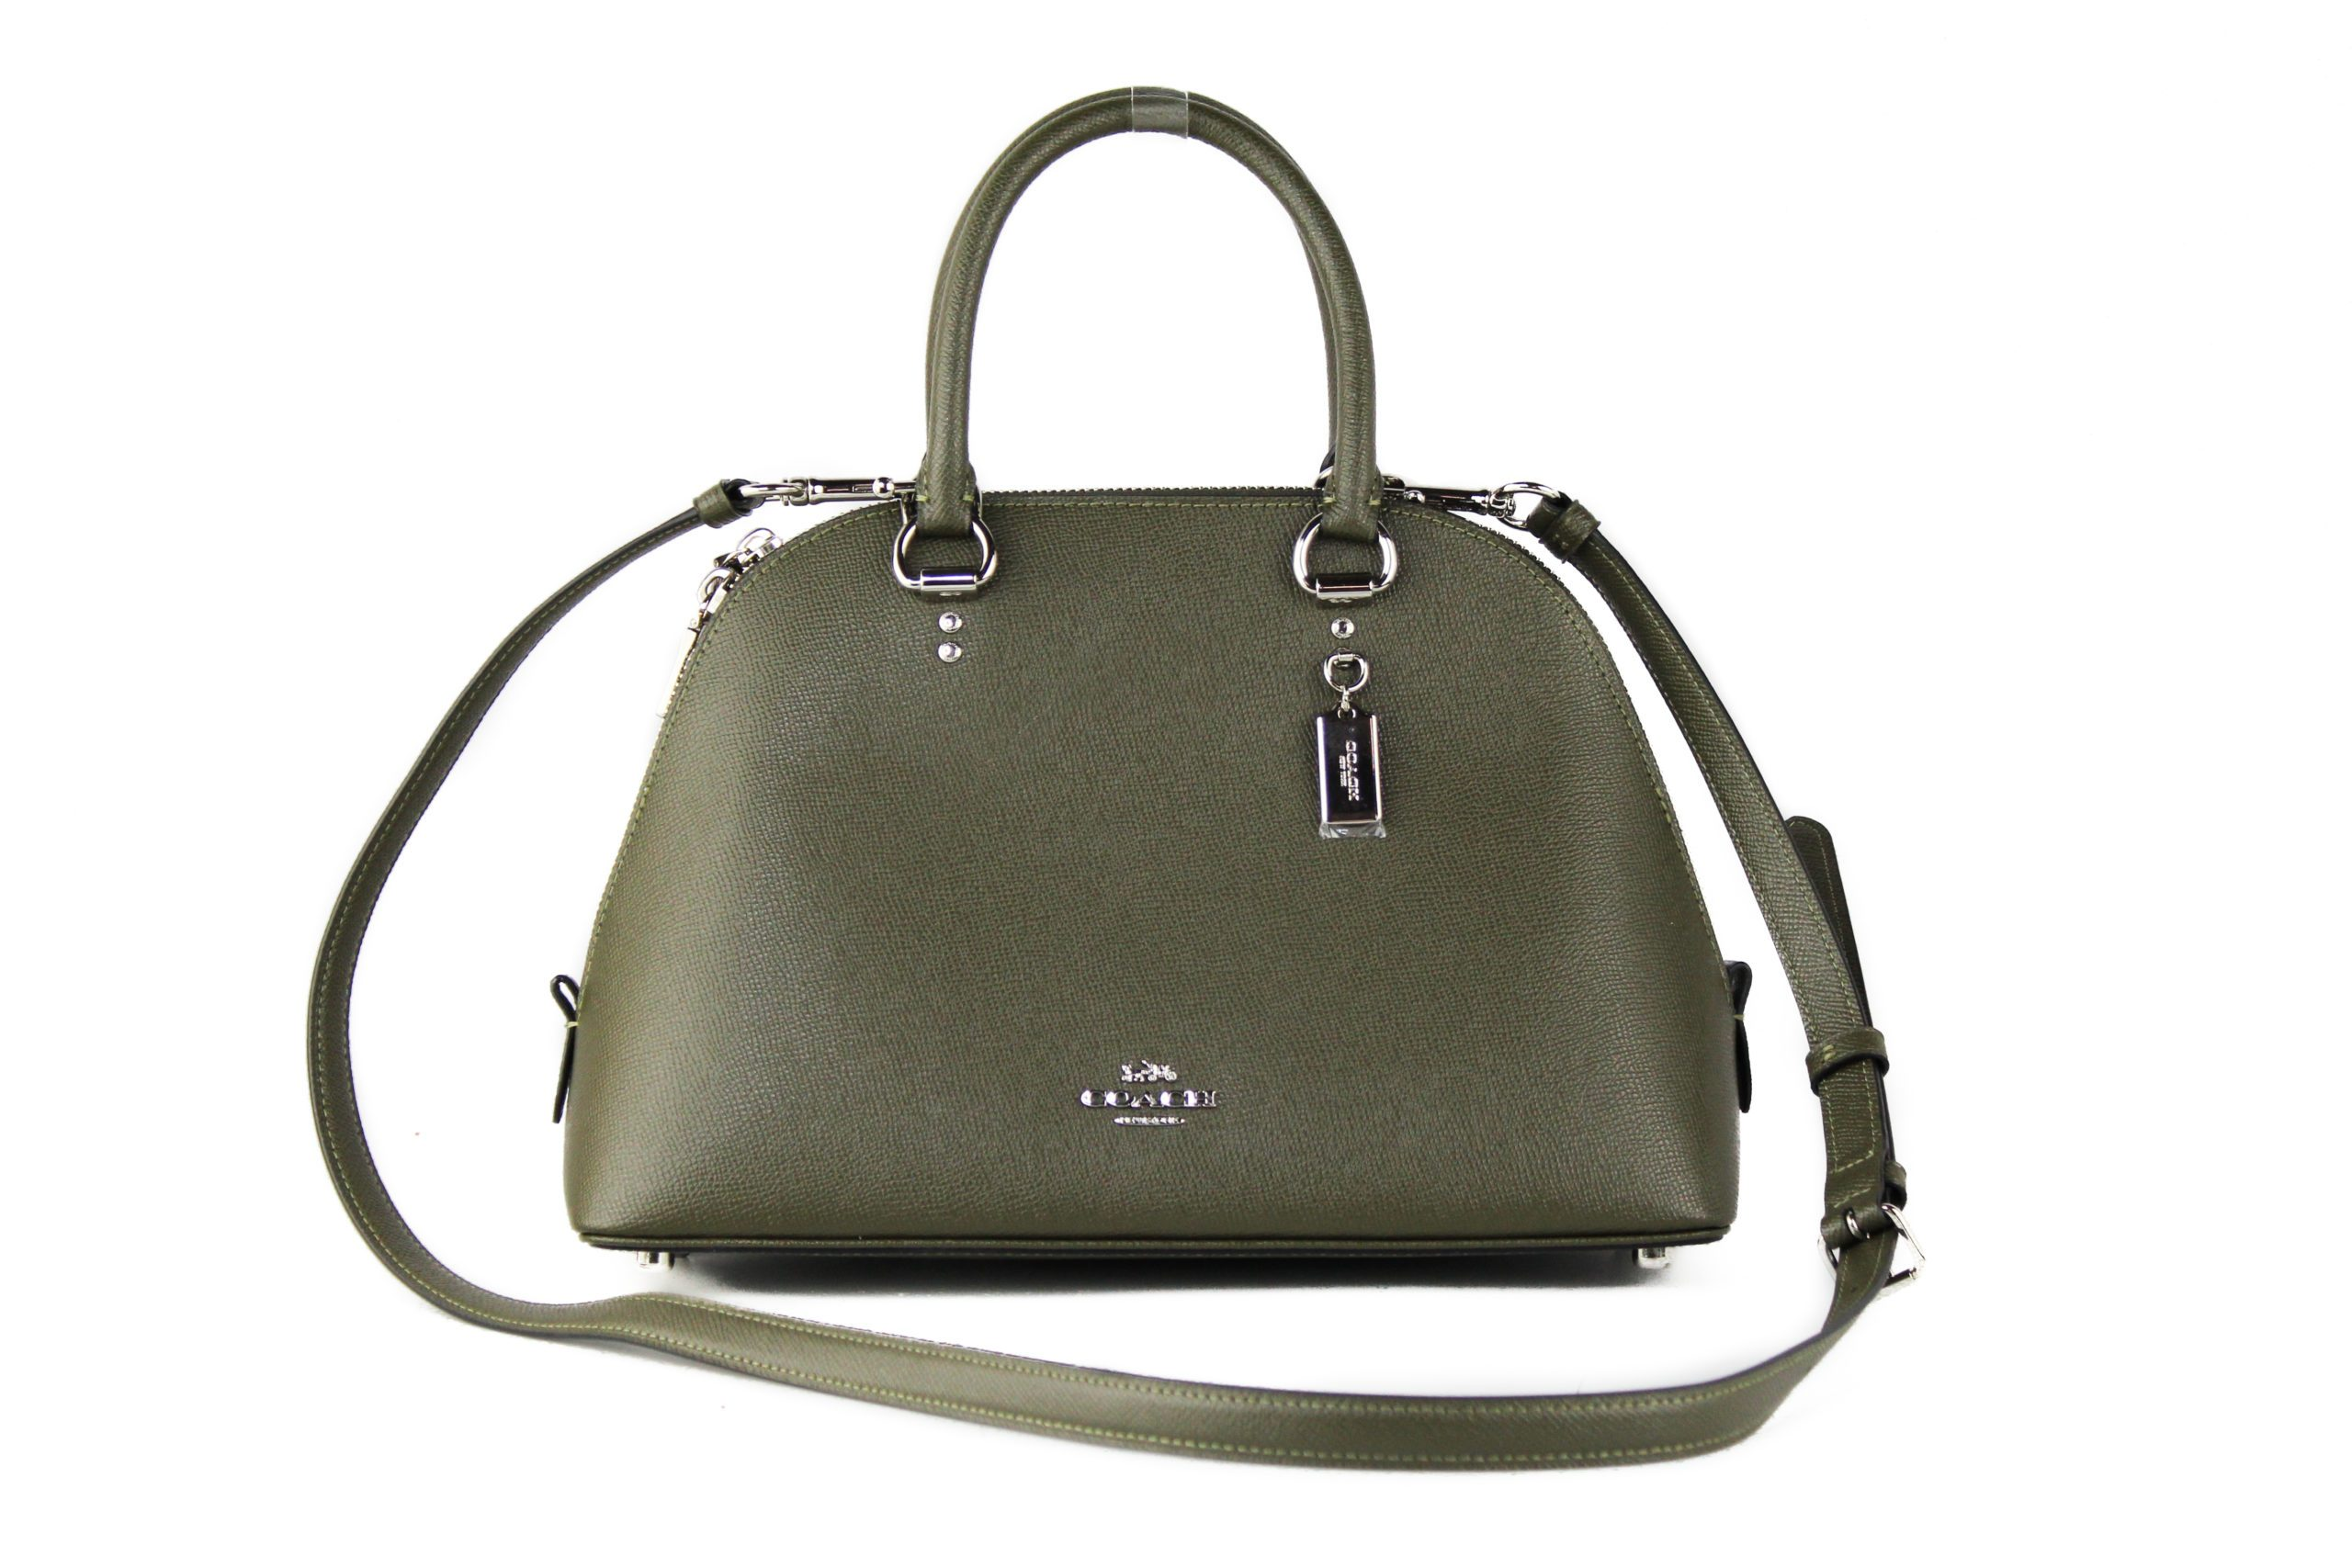 COACH Women's Katy Satchel Bag Cargo Green 93723